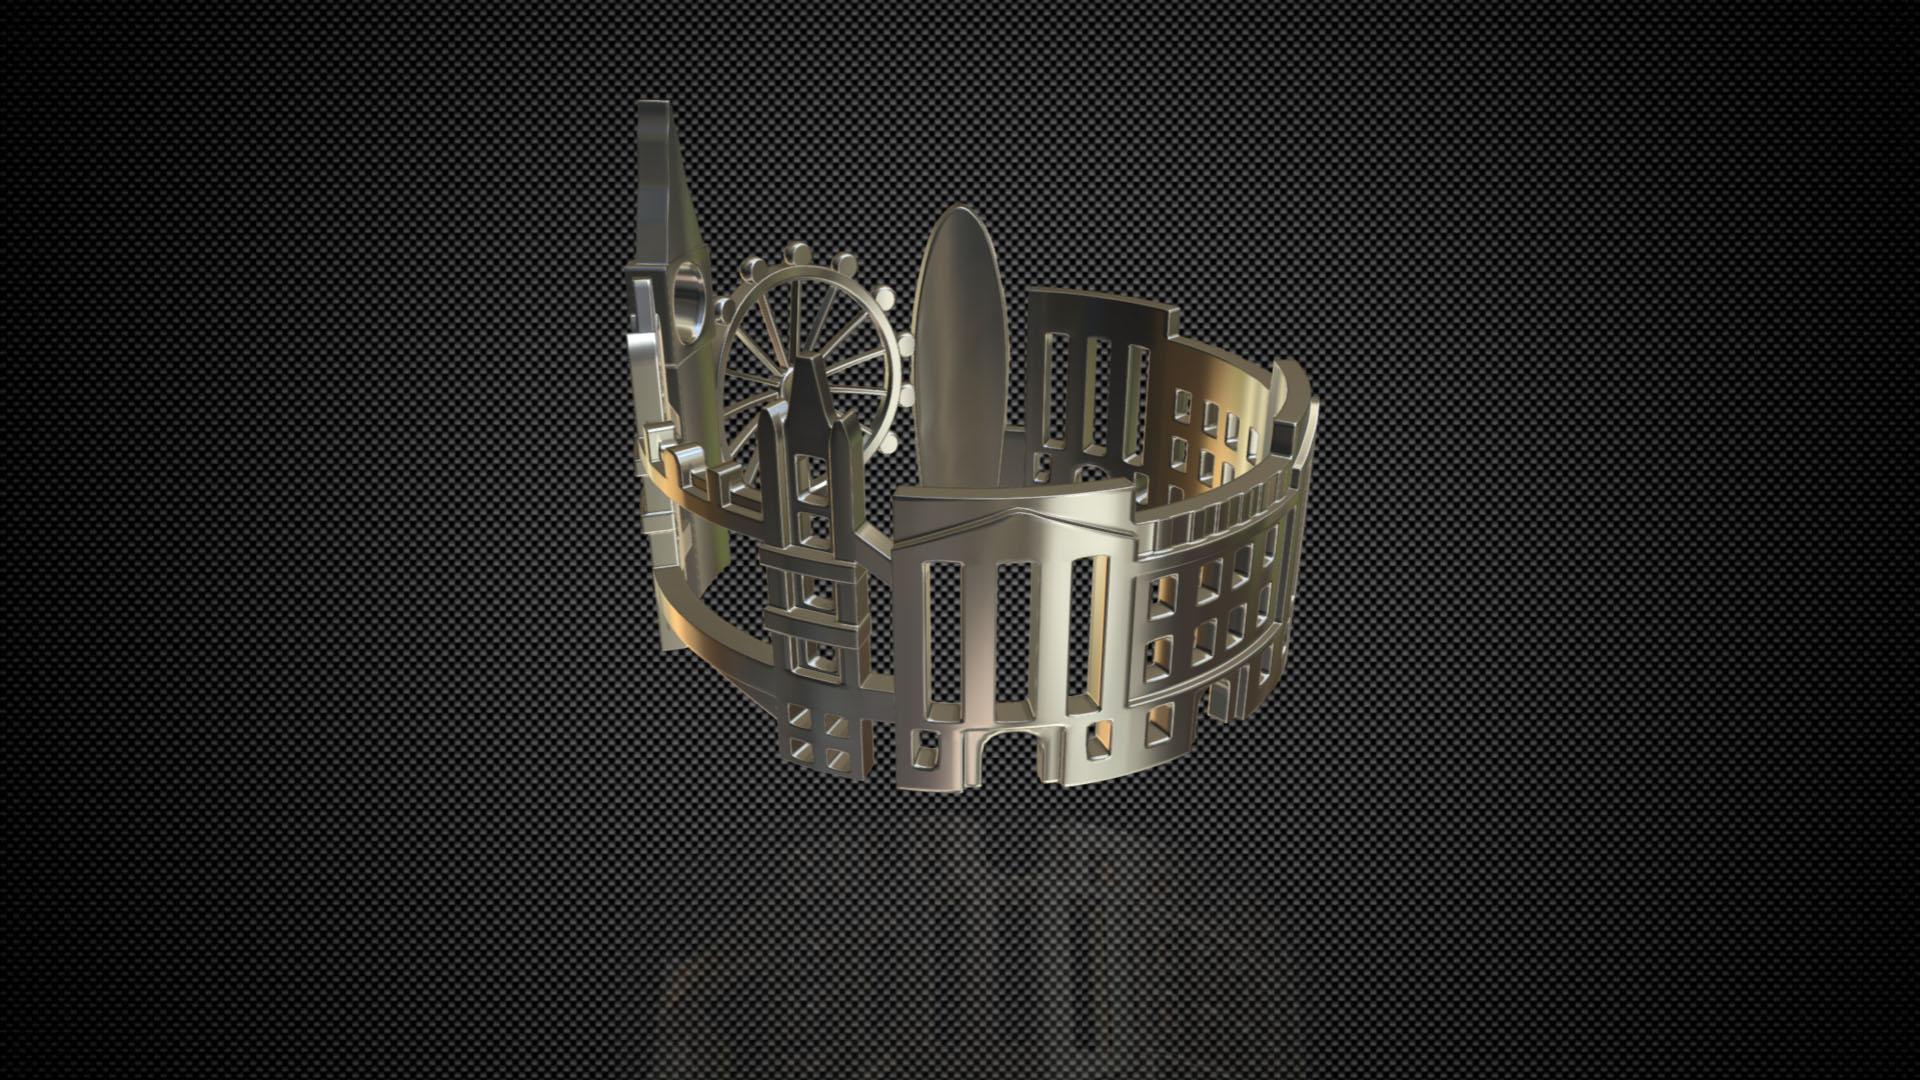 cityscape design ring london 3d model 3ds fbx c4d lwo ma mb 3dm hrc xsi  obj 271345